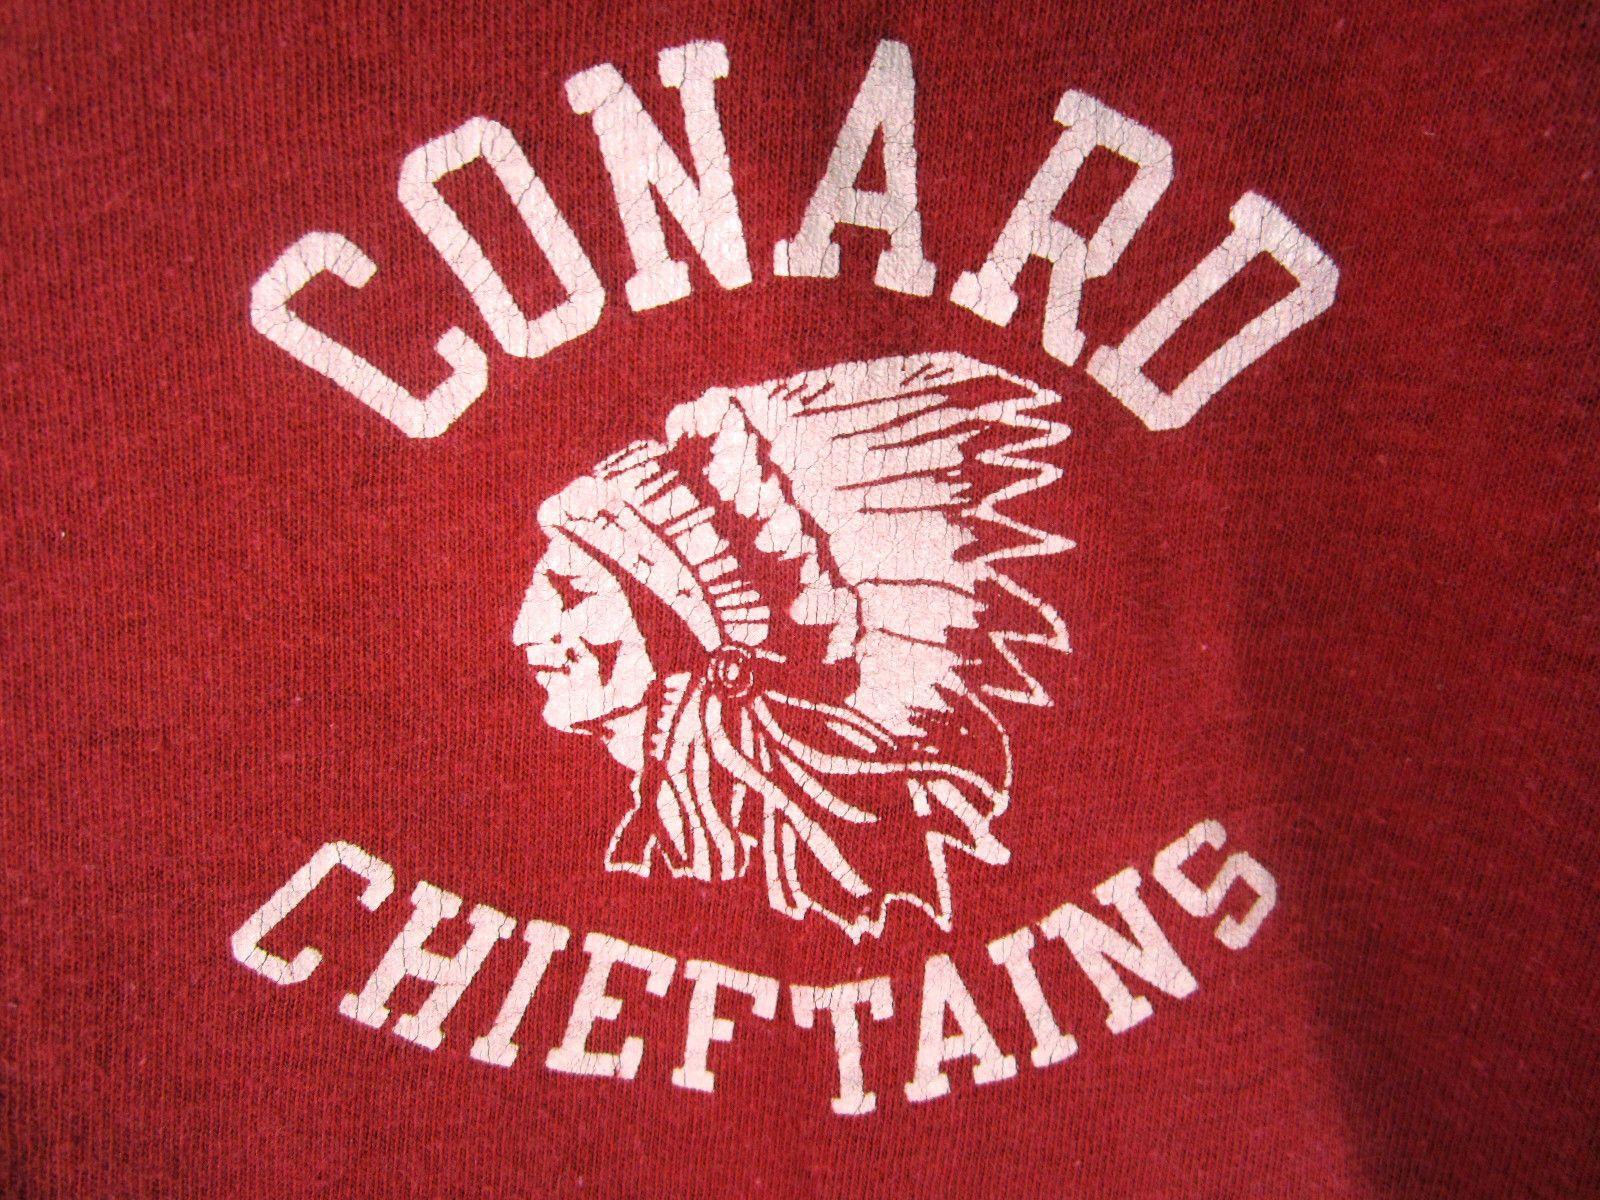 vtg champion blue bar tag t shirt conard chieftains native